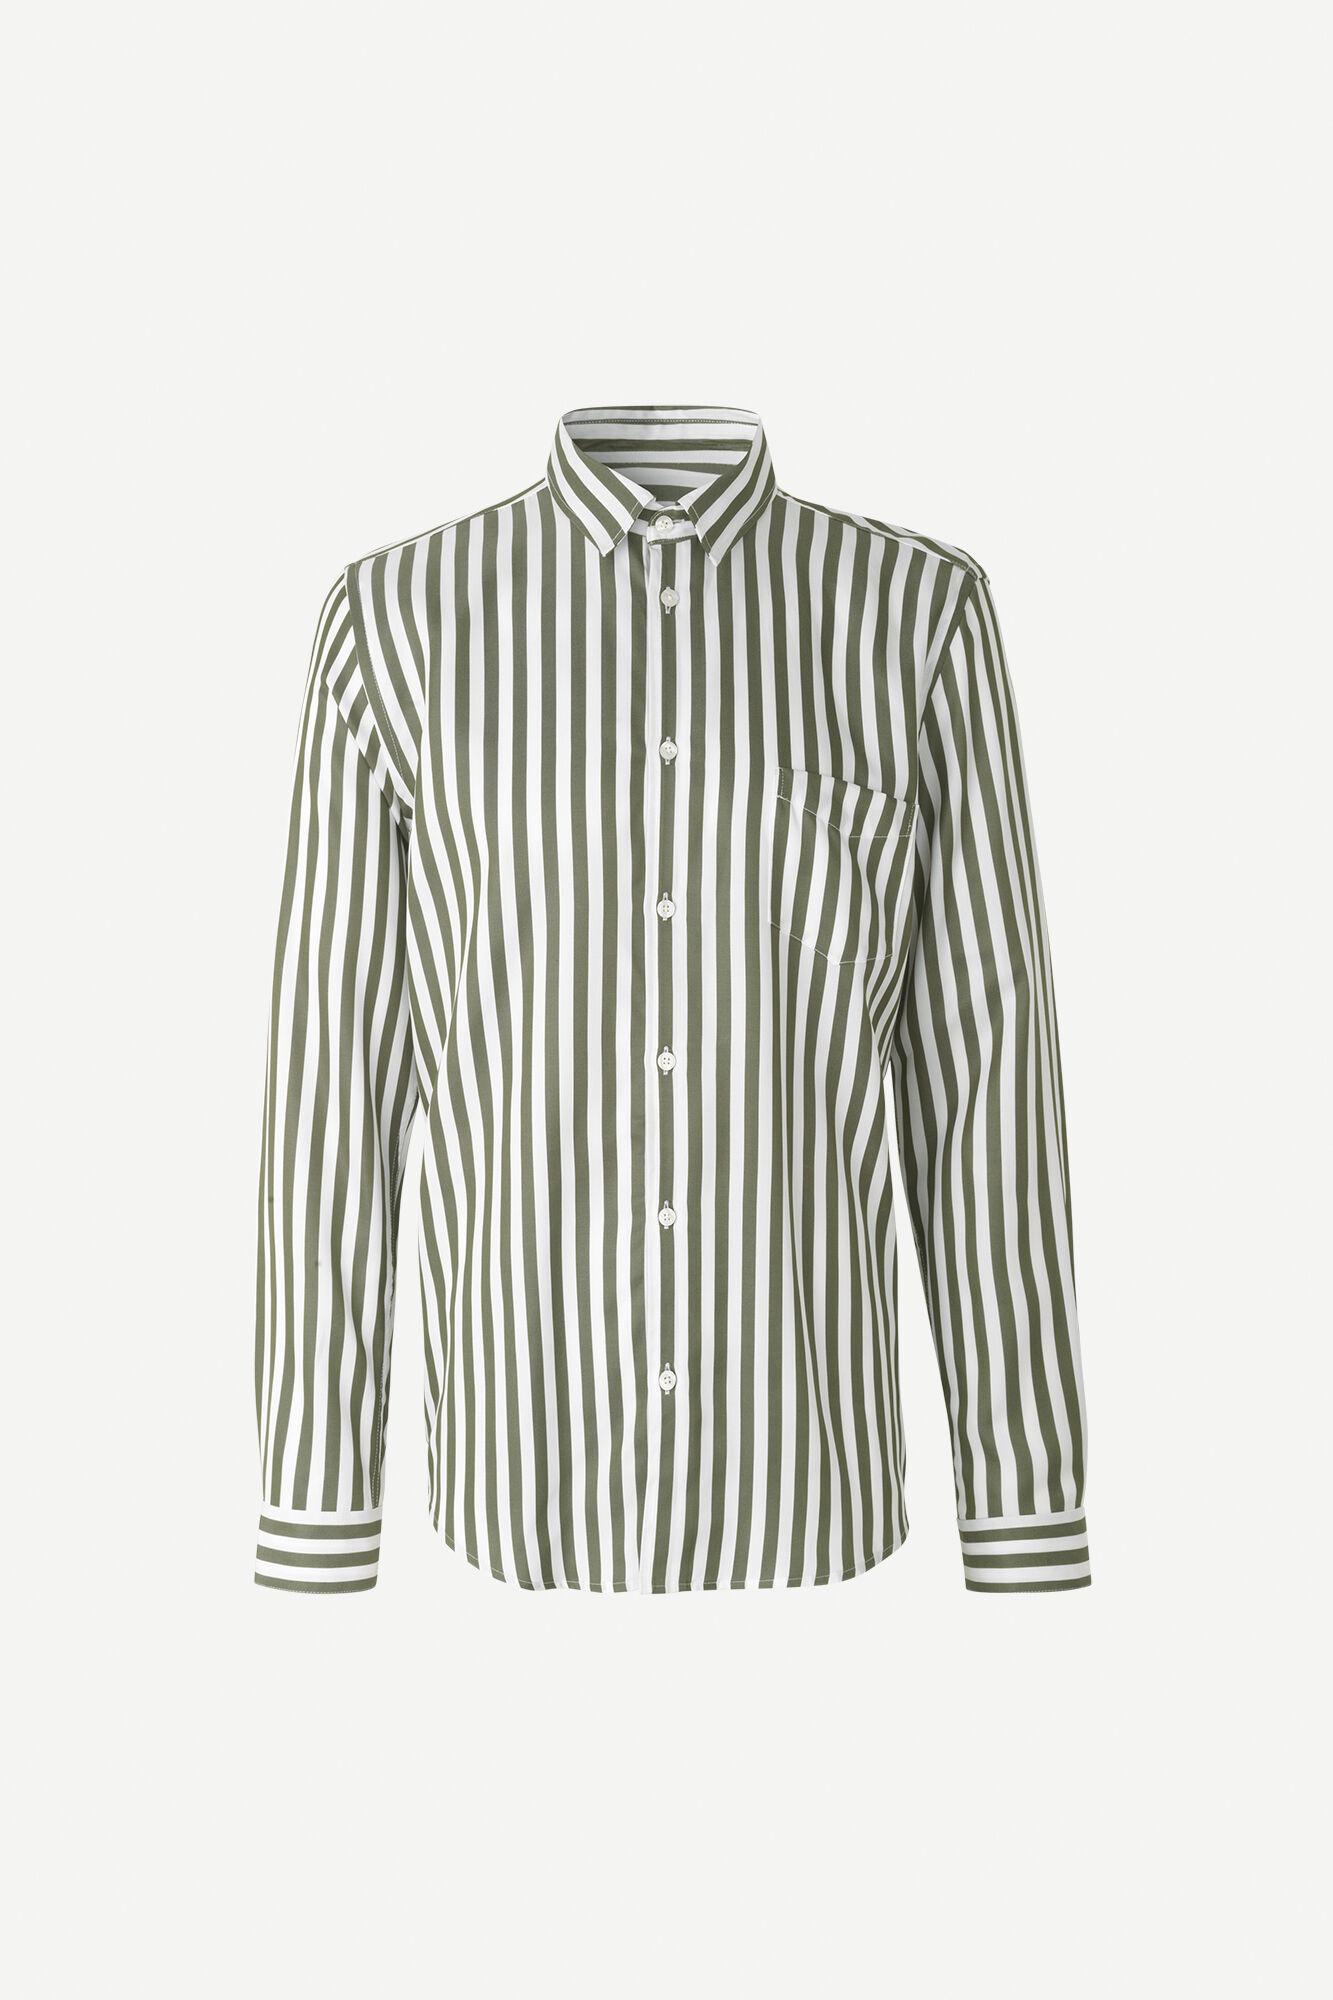 Liam Deep Lichen White Green Striped Shirt-1